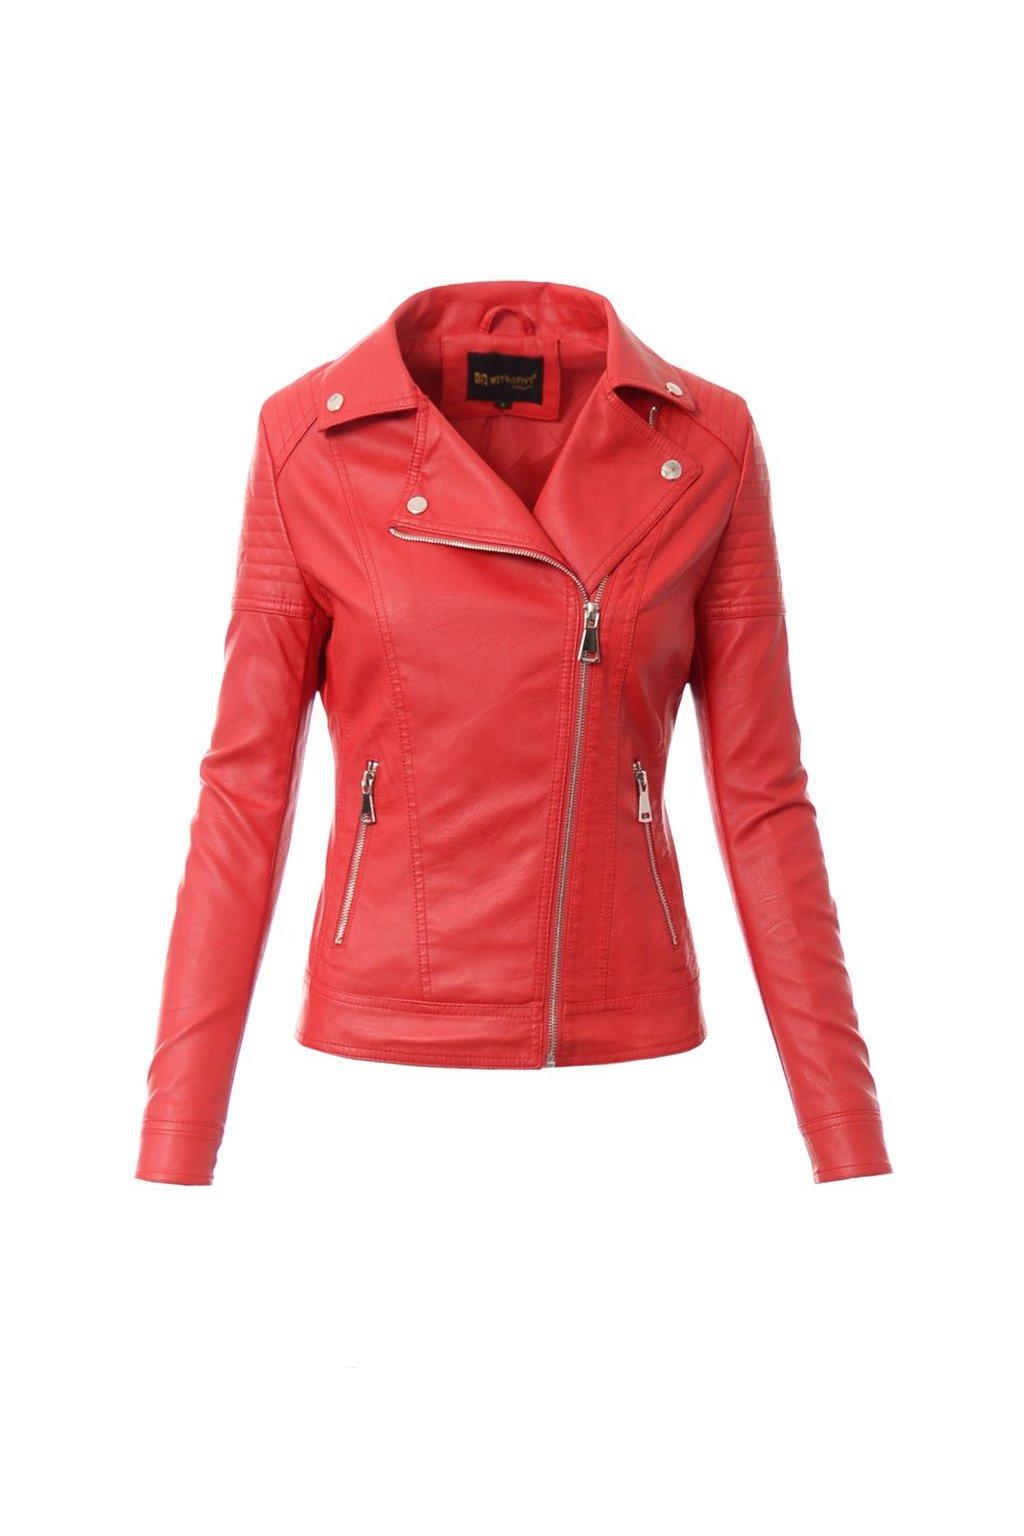 Dámska kožená bunda biker 4036 červená